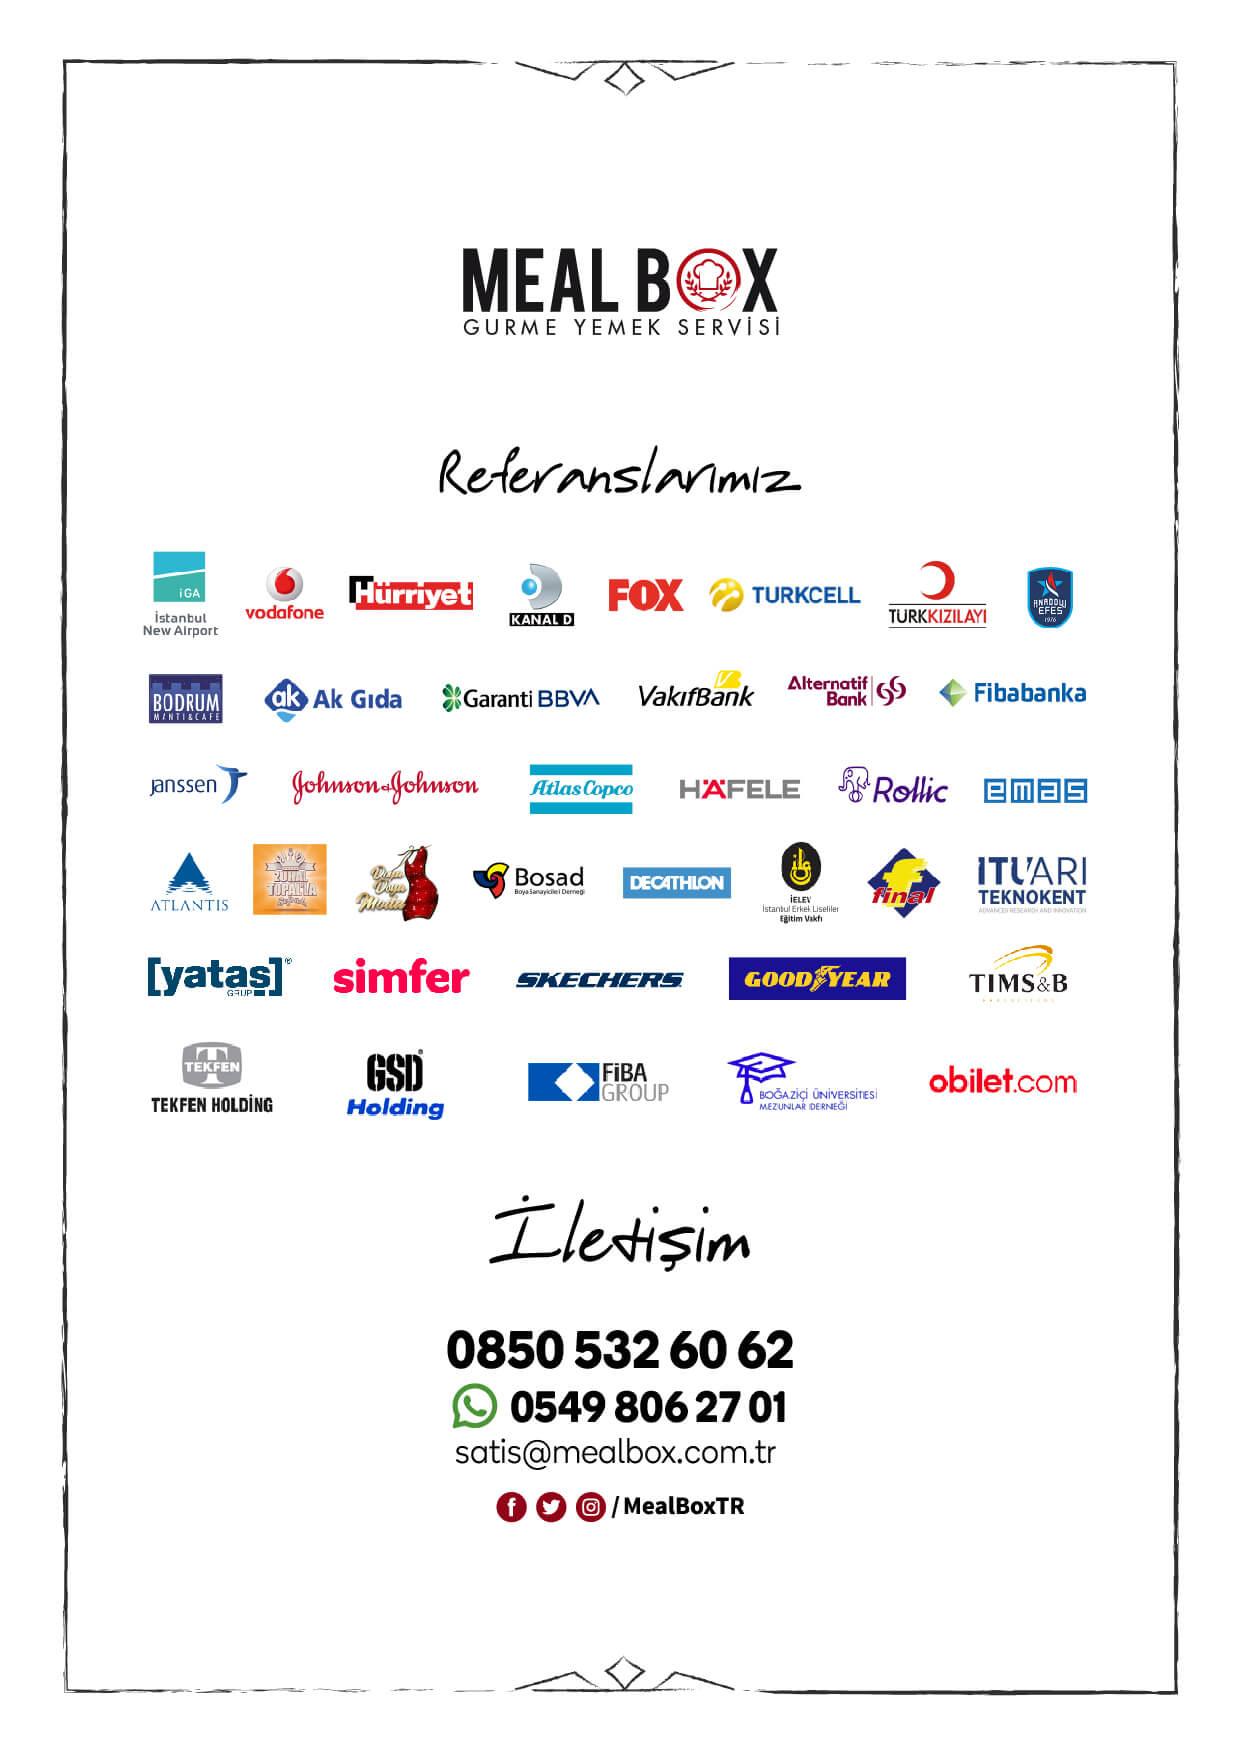 Meal Box Menüsü